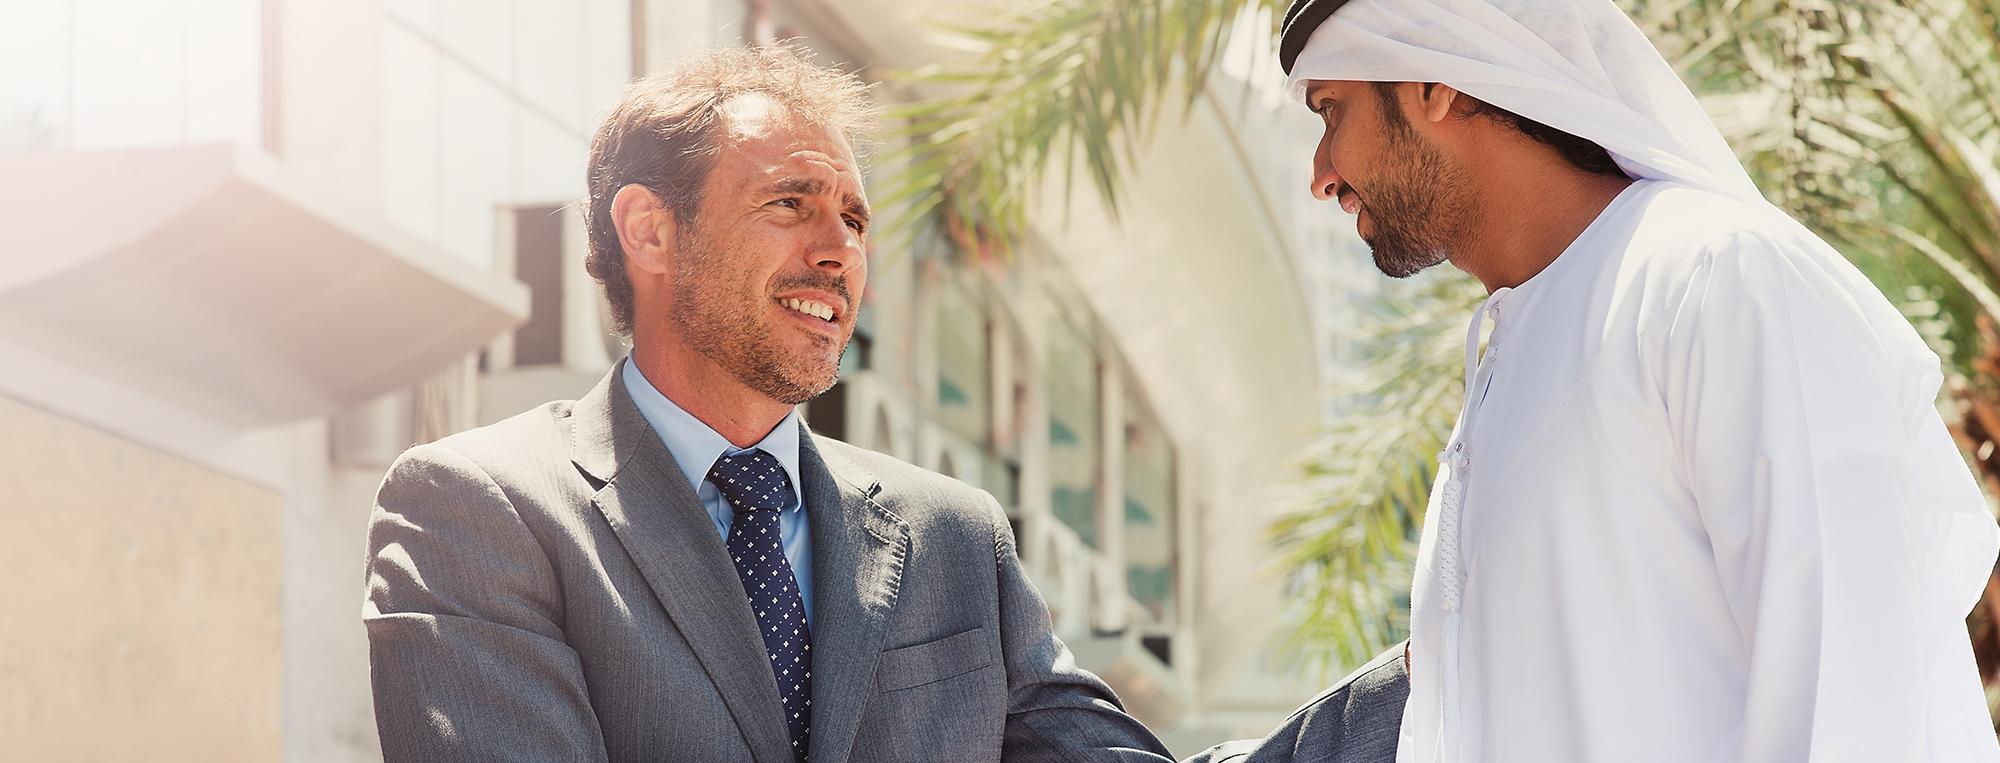 Home Abu Dhabi School Of Management